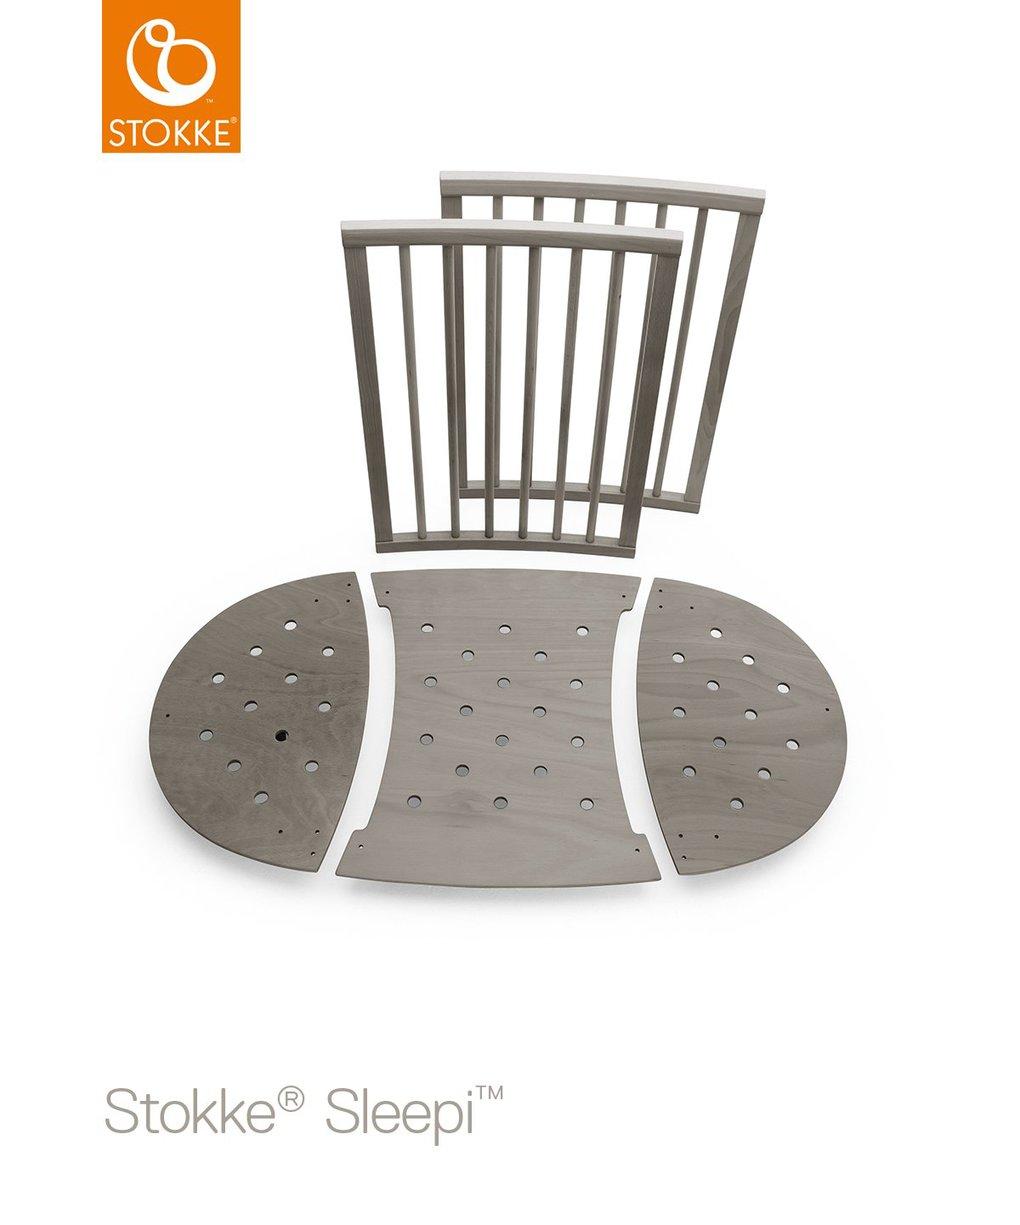 Stokke® sleepi™ estensione letto - hazy grey - Stokke